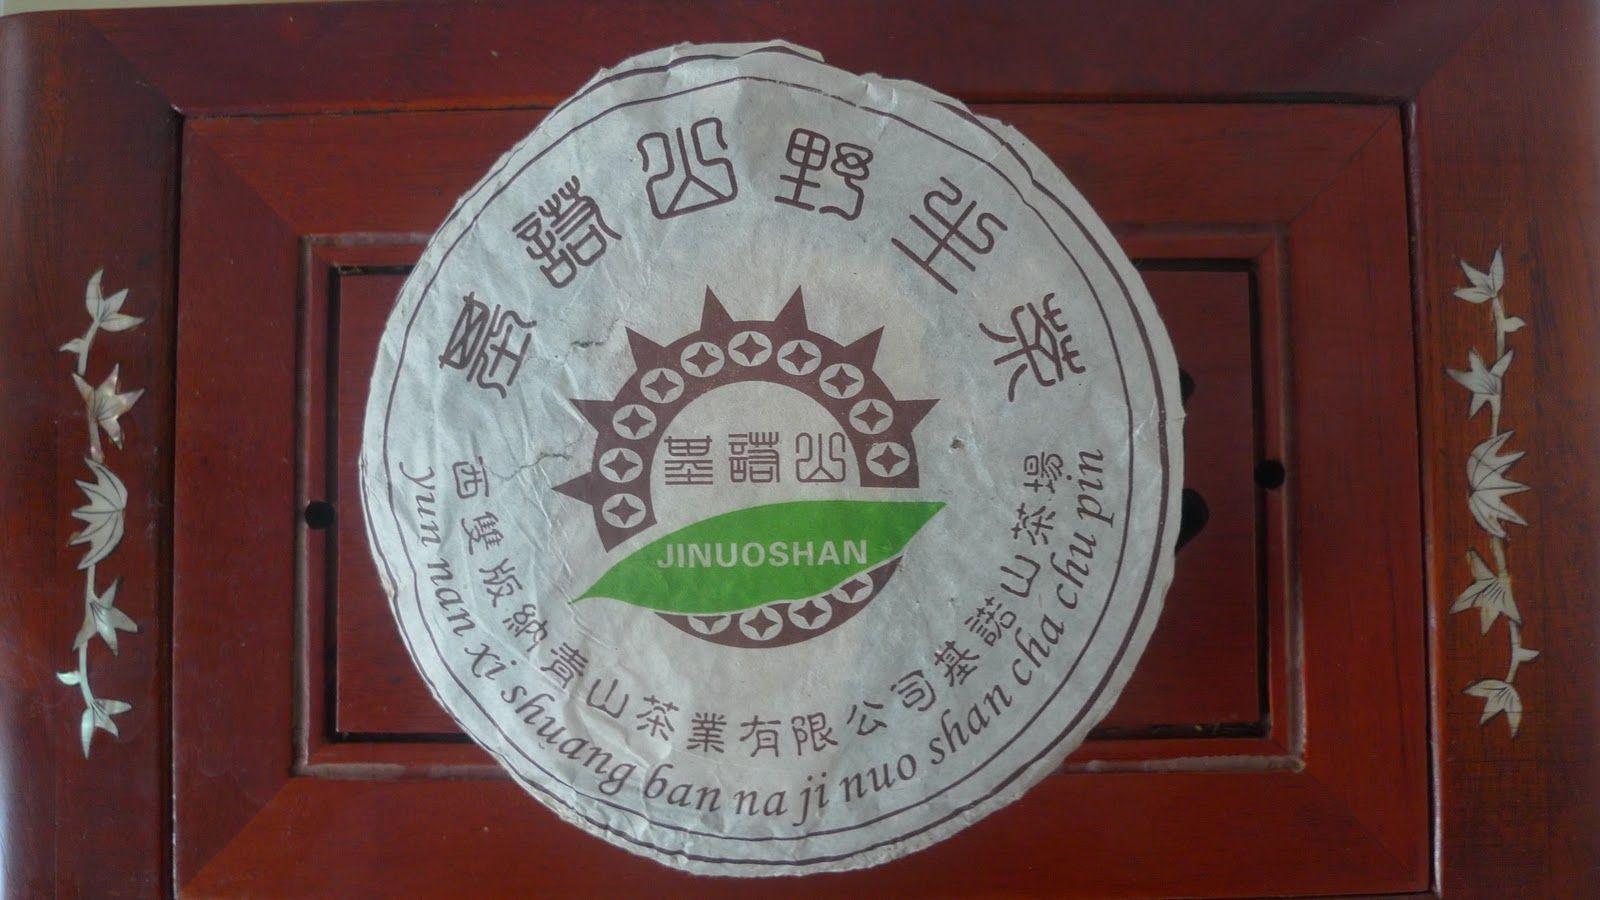 2004 Jinuoshan Youle